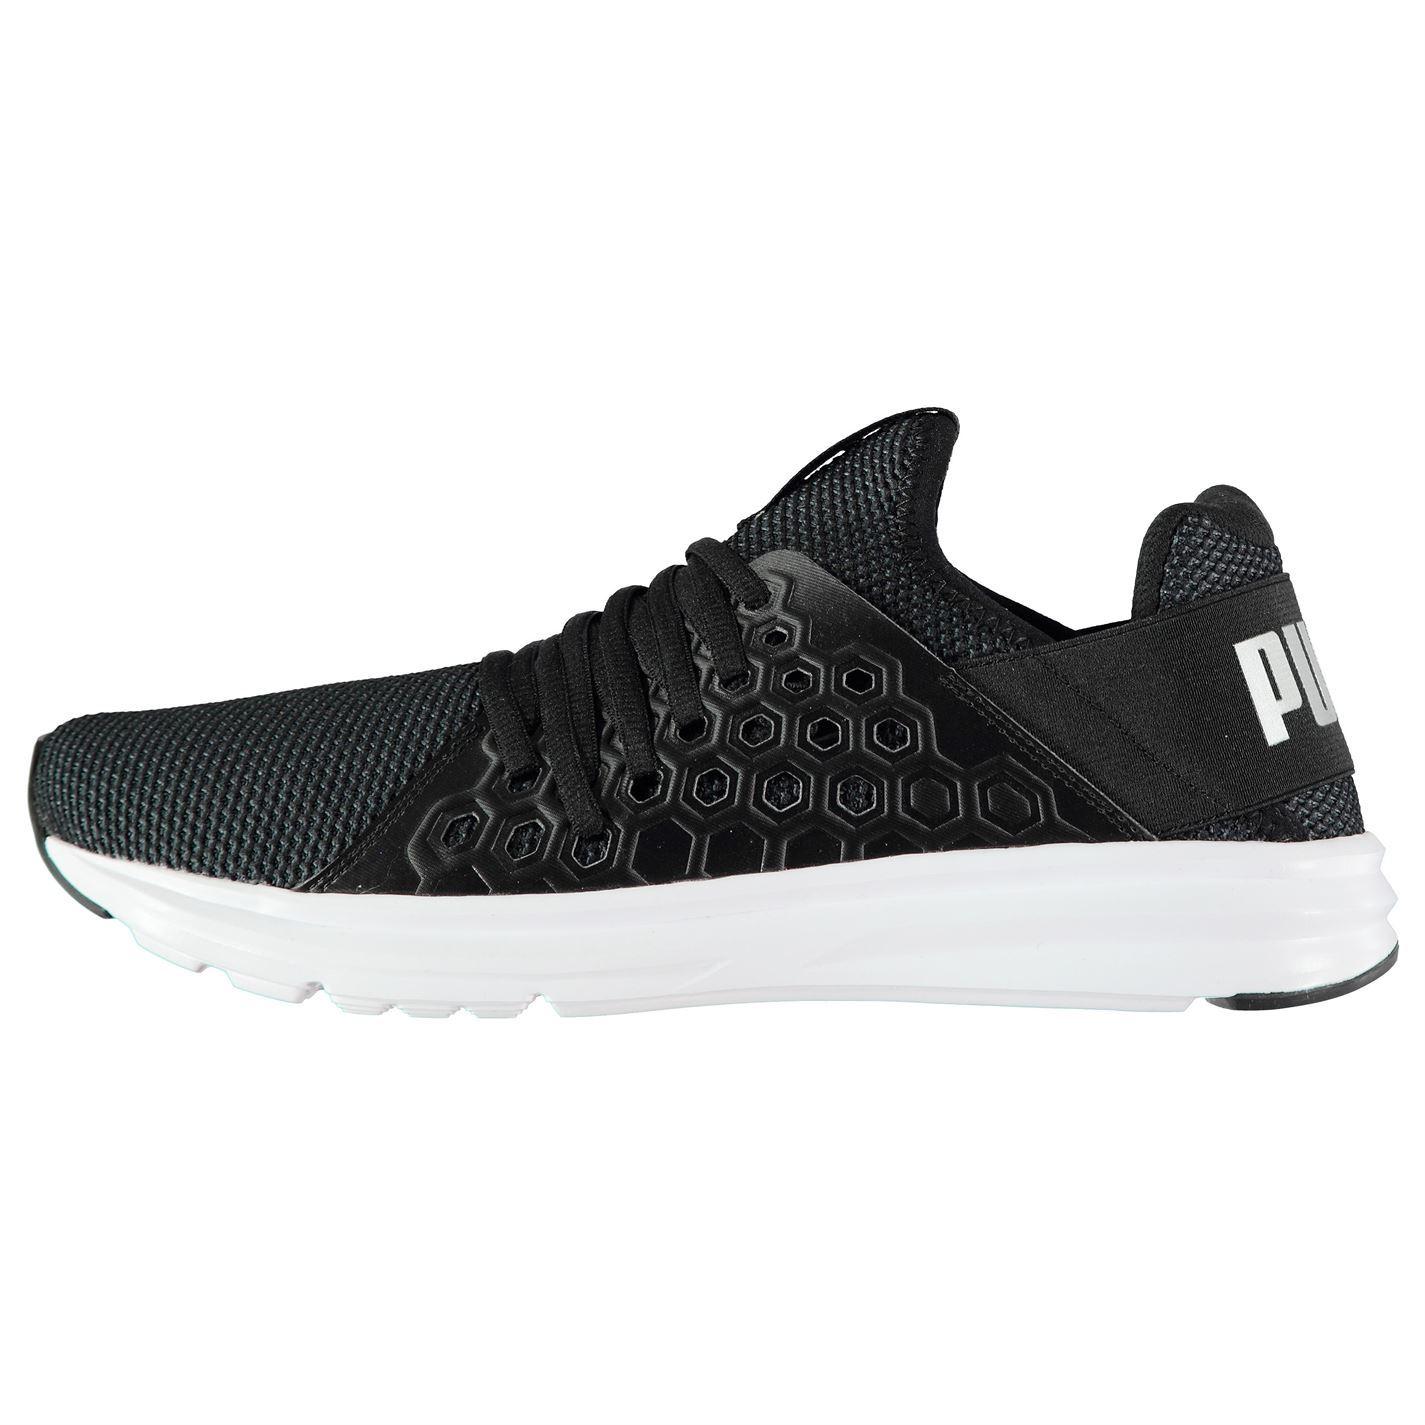 9650ecc3faf3 ... Puma Enzo NF Trainers Mens Black Sports Shoes Sneakers ...